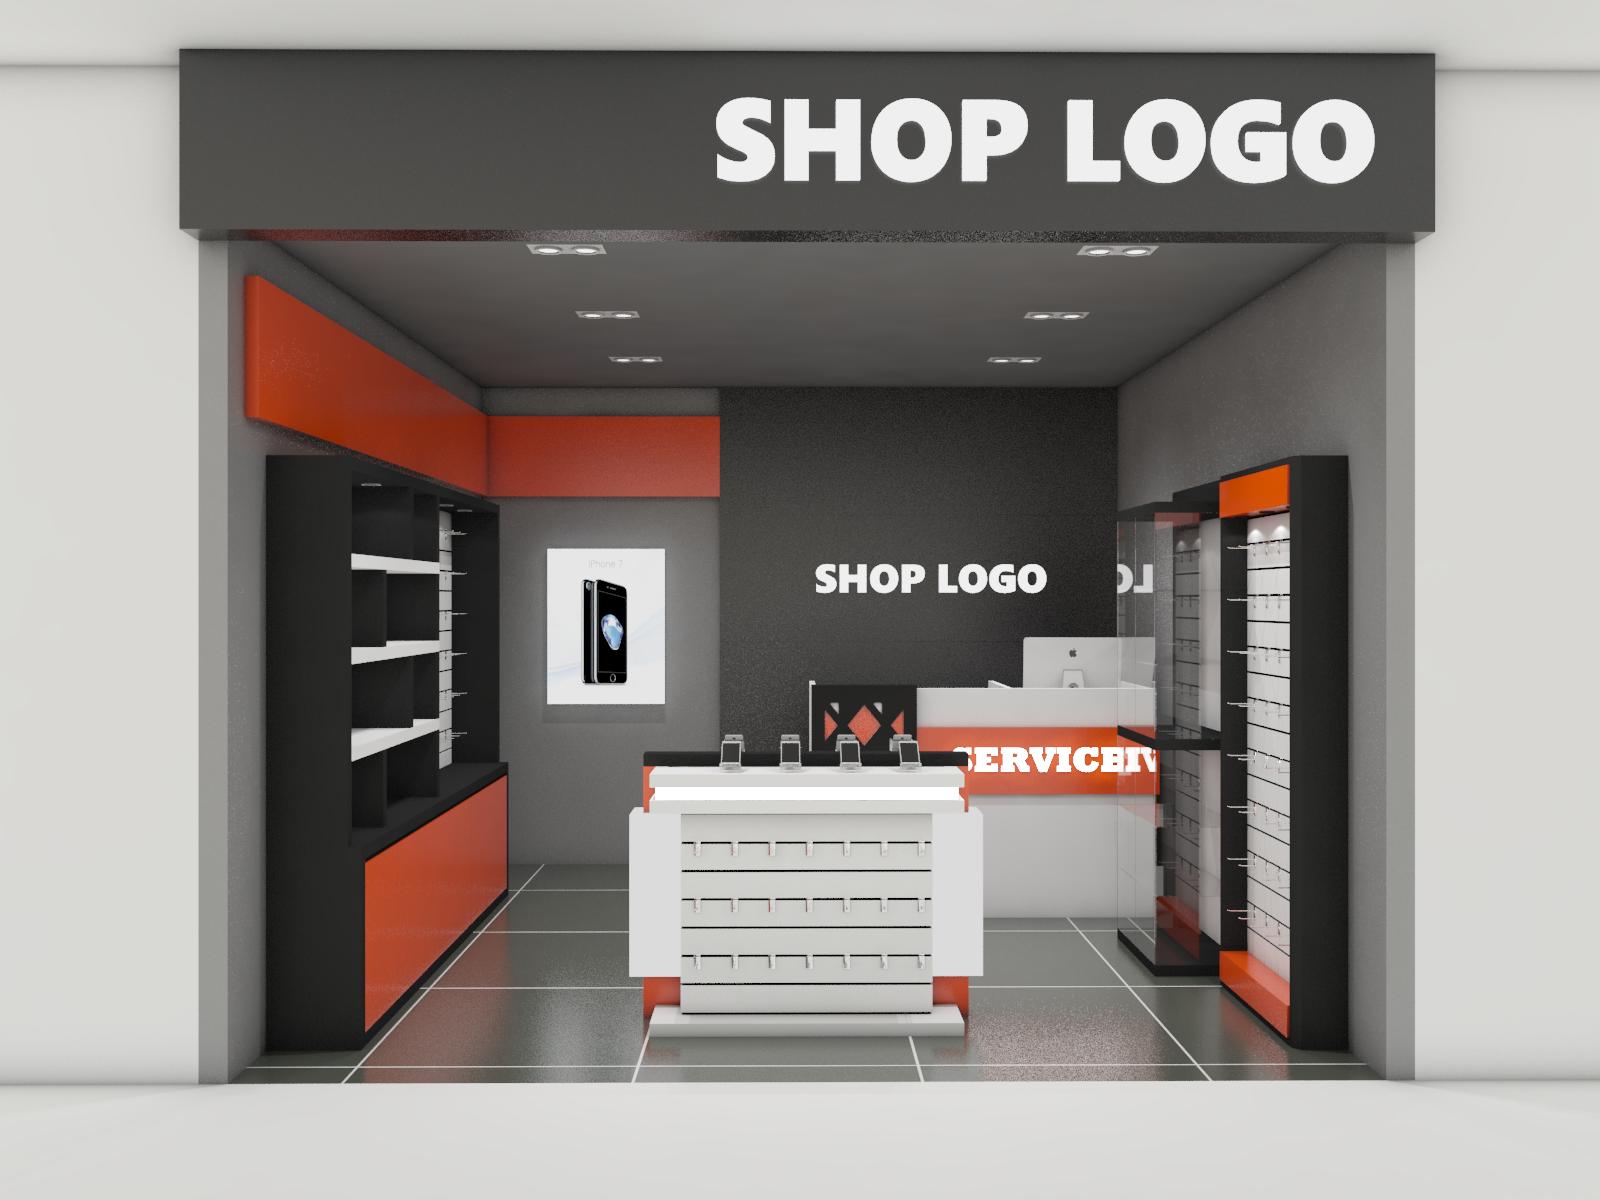 Shop set design 1(copy)(copy)(copy)(copy)(copy)(copy)(copy)(copy)(copy)(copy)(copy)(copy)(copy)(copy)(copy)(copy)